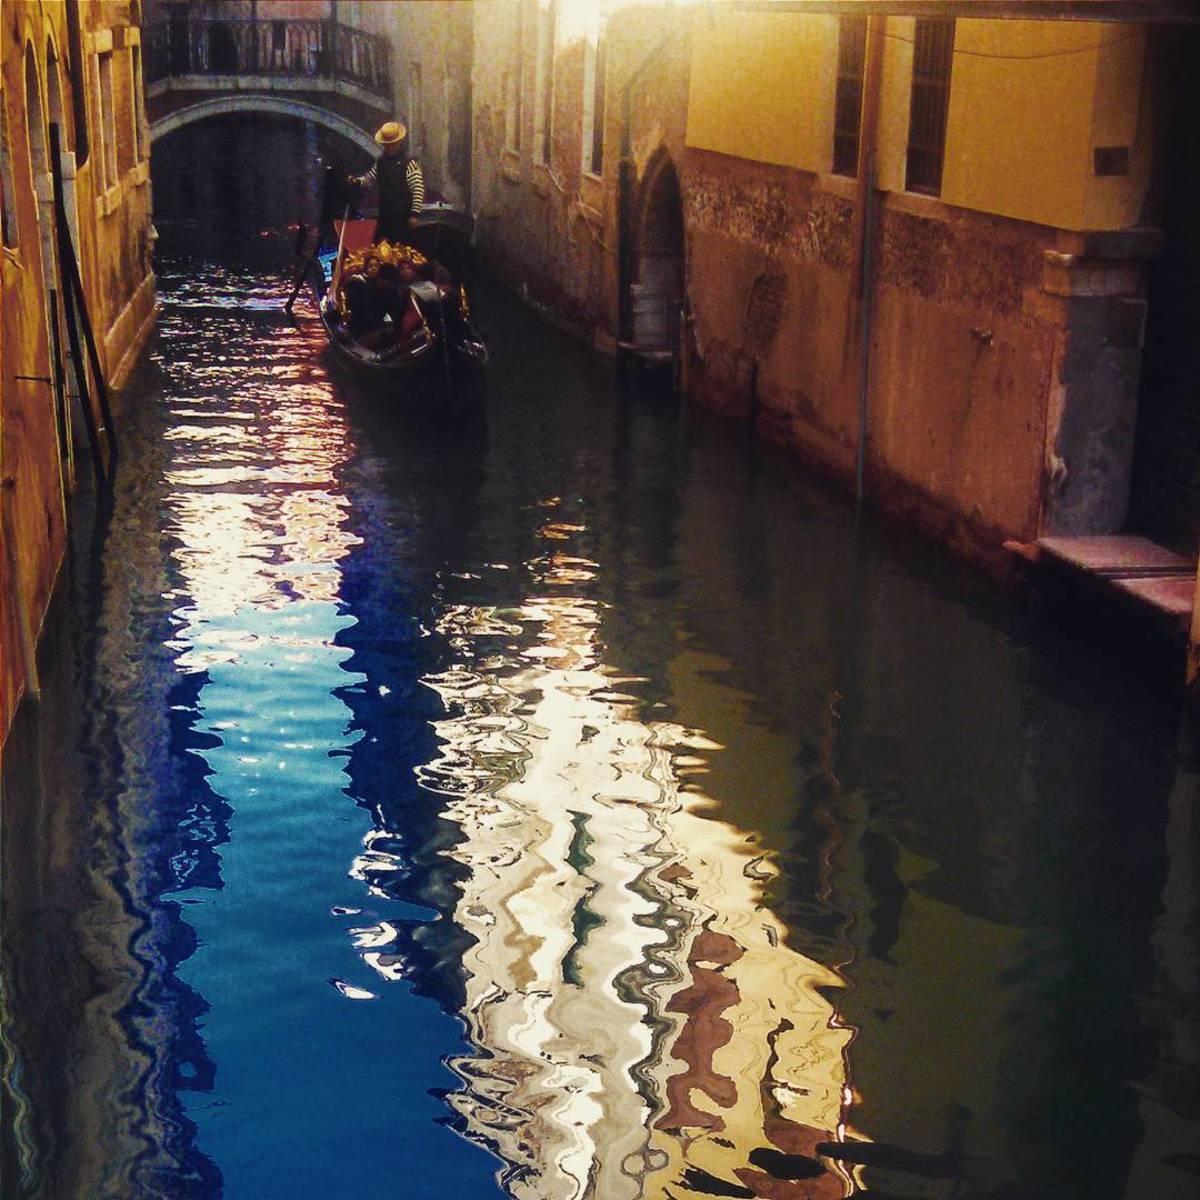 Your Classic Italian Vacation: A Gondola Ride in Venice